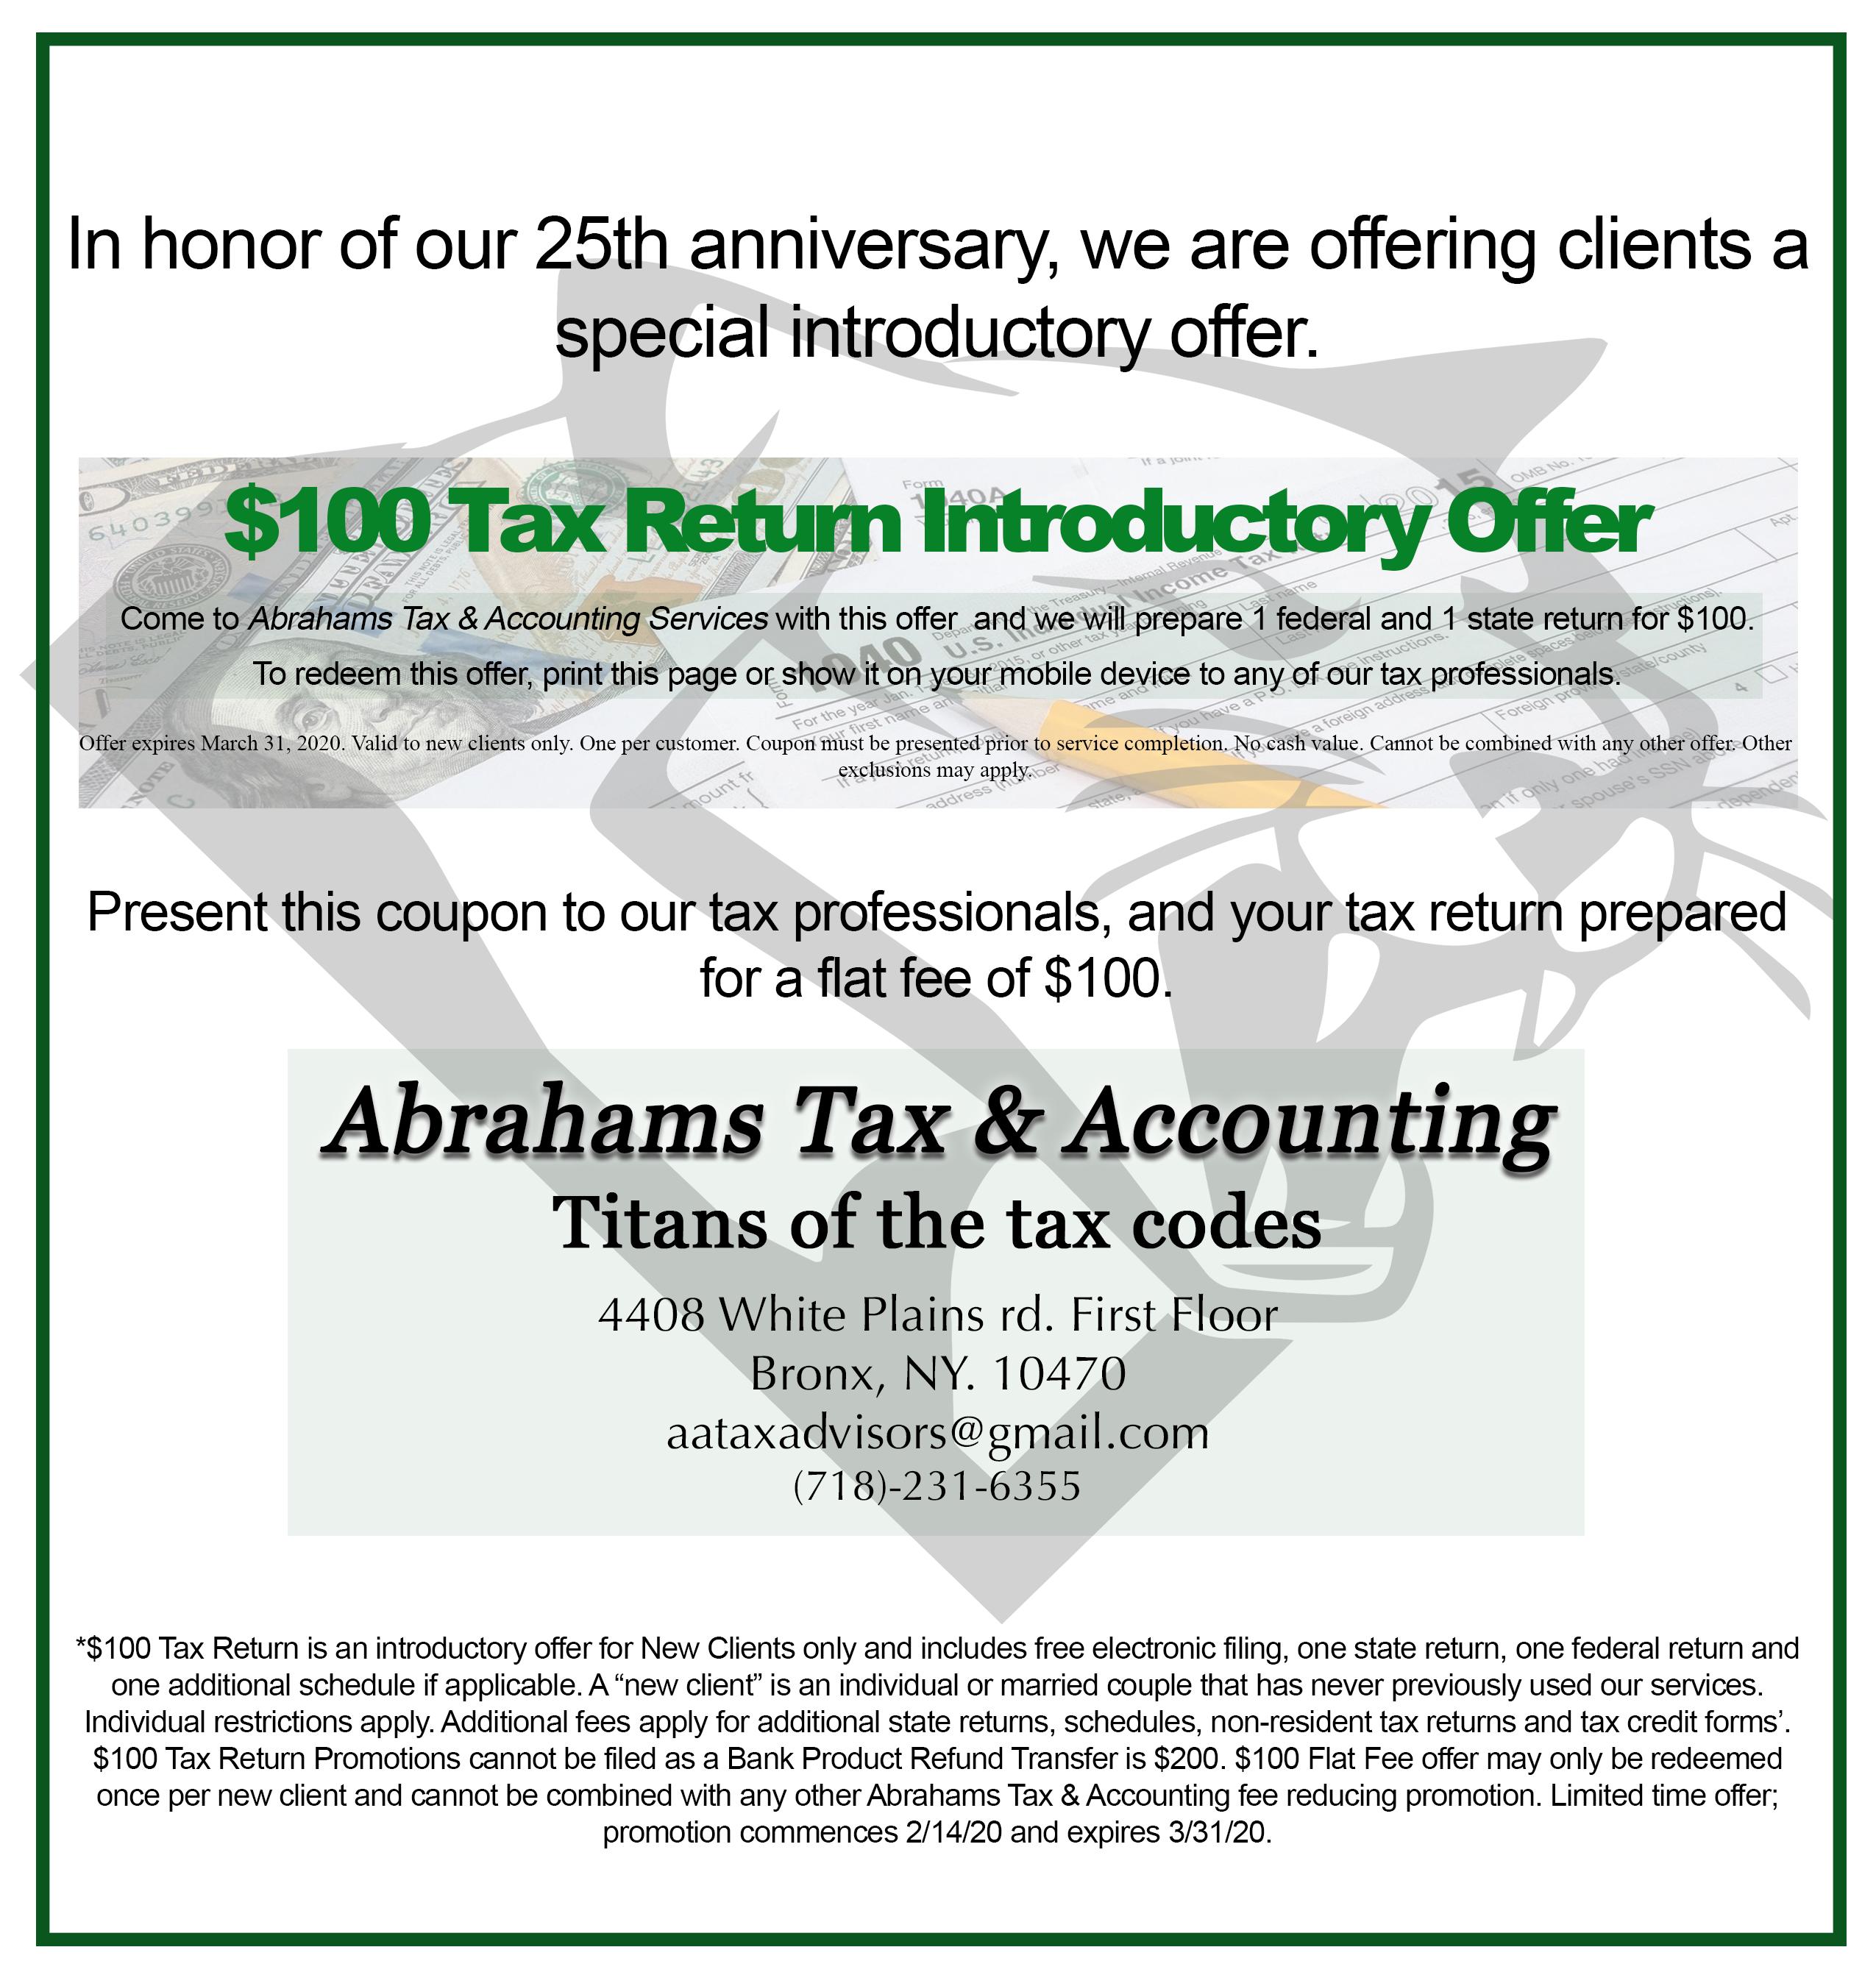 Tax preparation services in White Plains, Bronx, New York